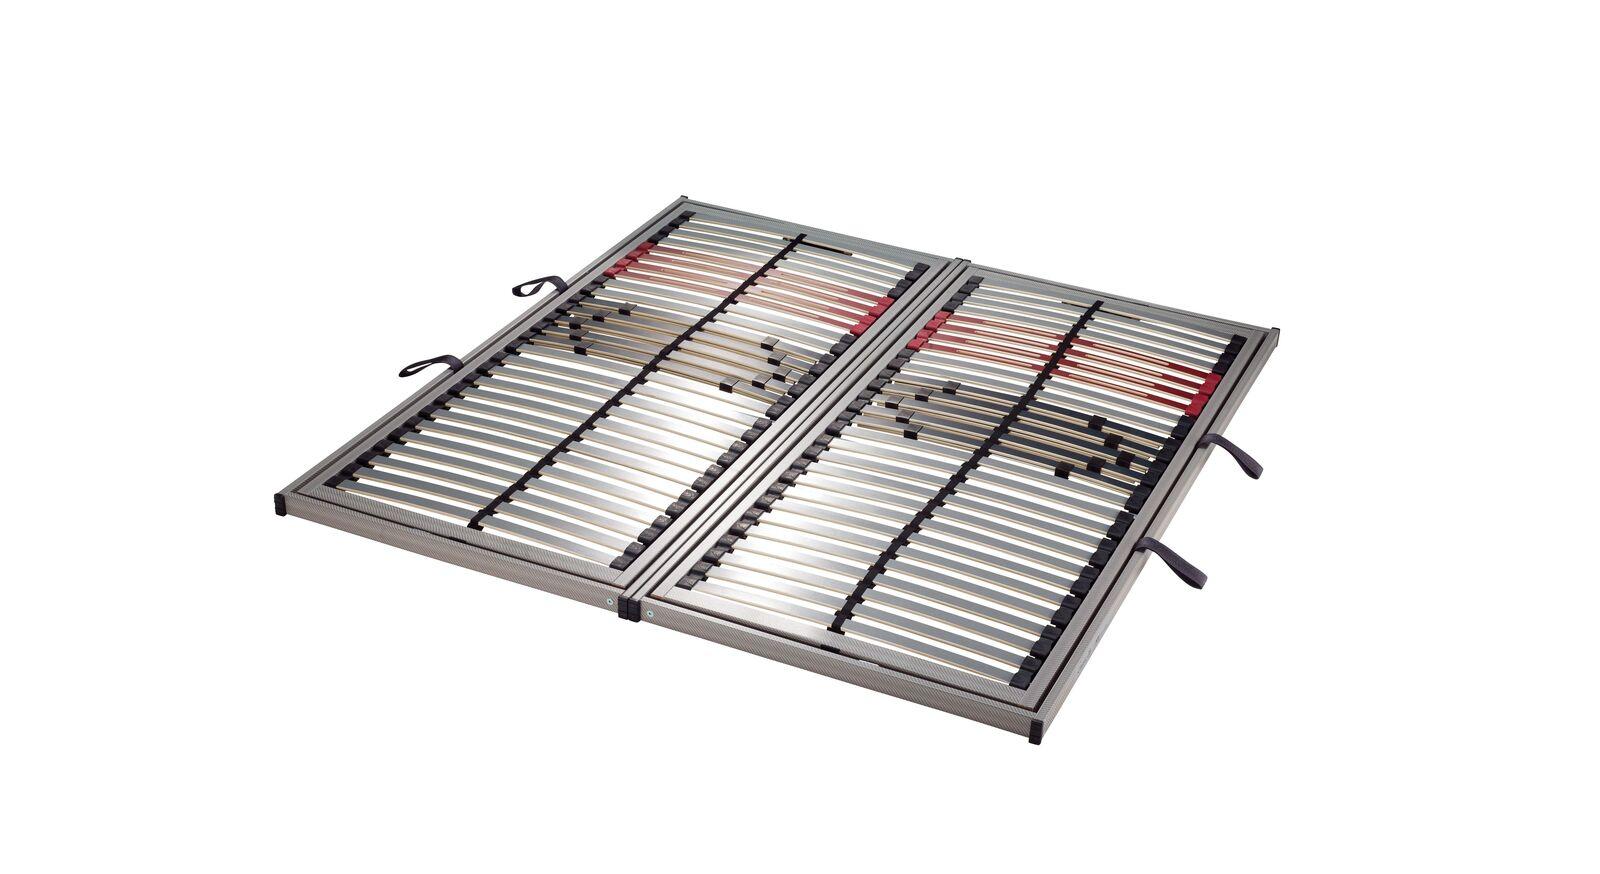 Hochwertig verarbeiteter SCHLARAFFIA Bettkasten-Lattenrost Classic 28 Side Lift